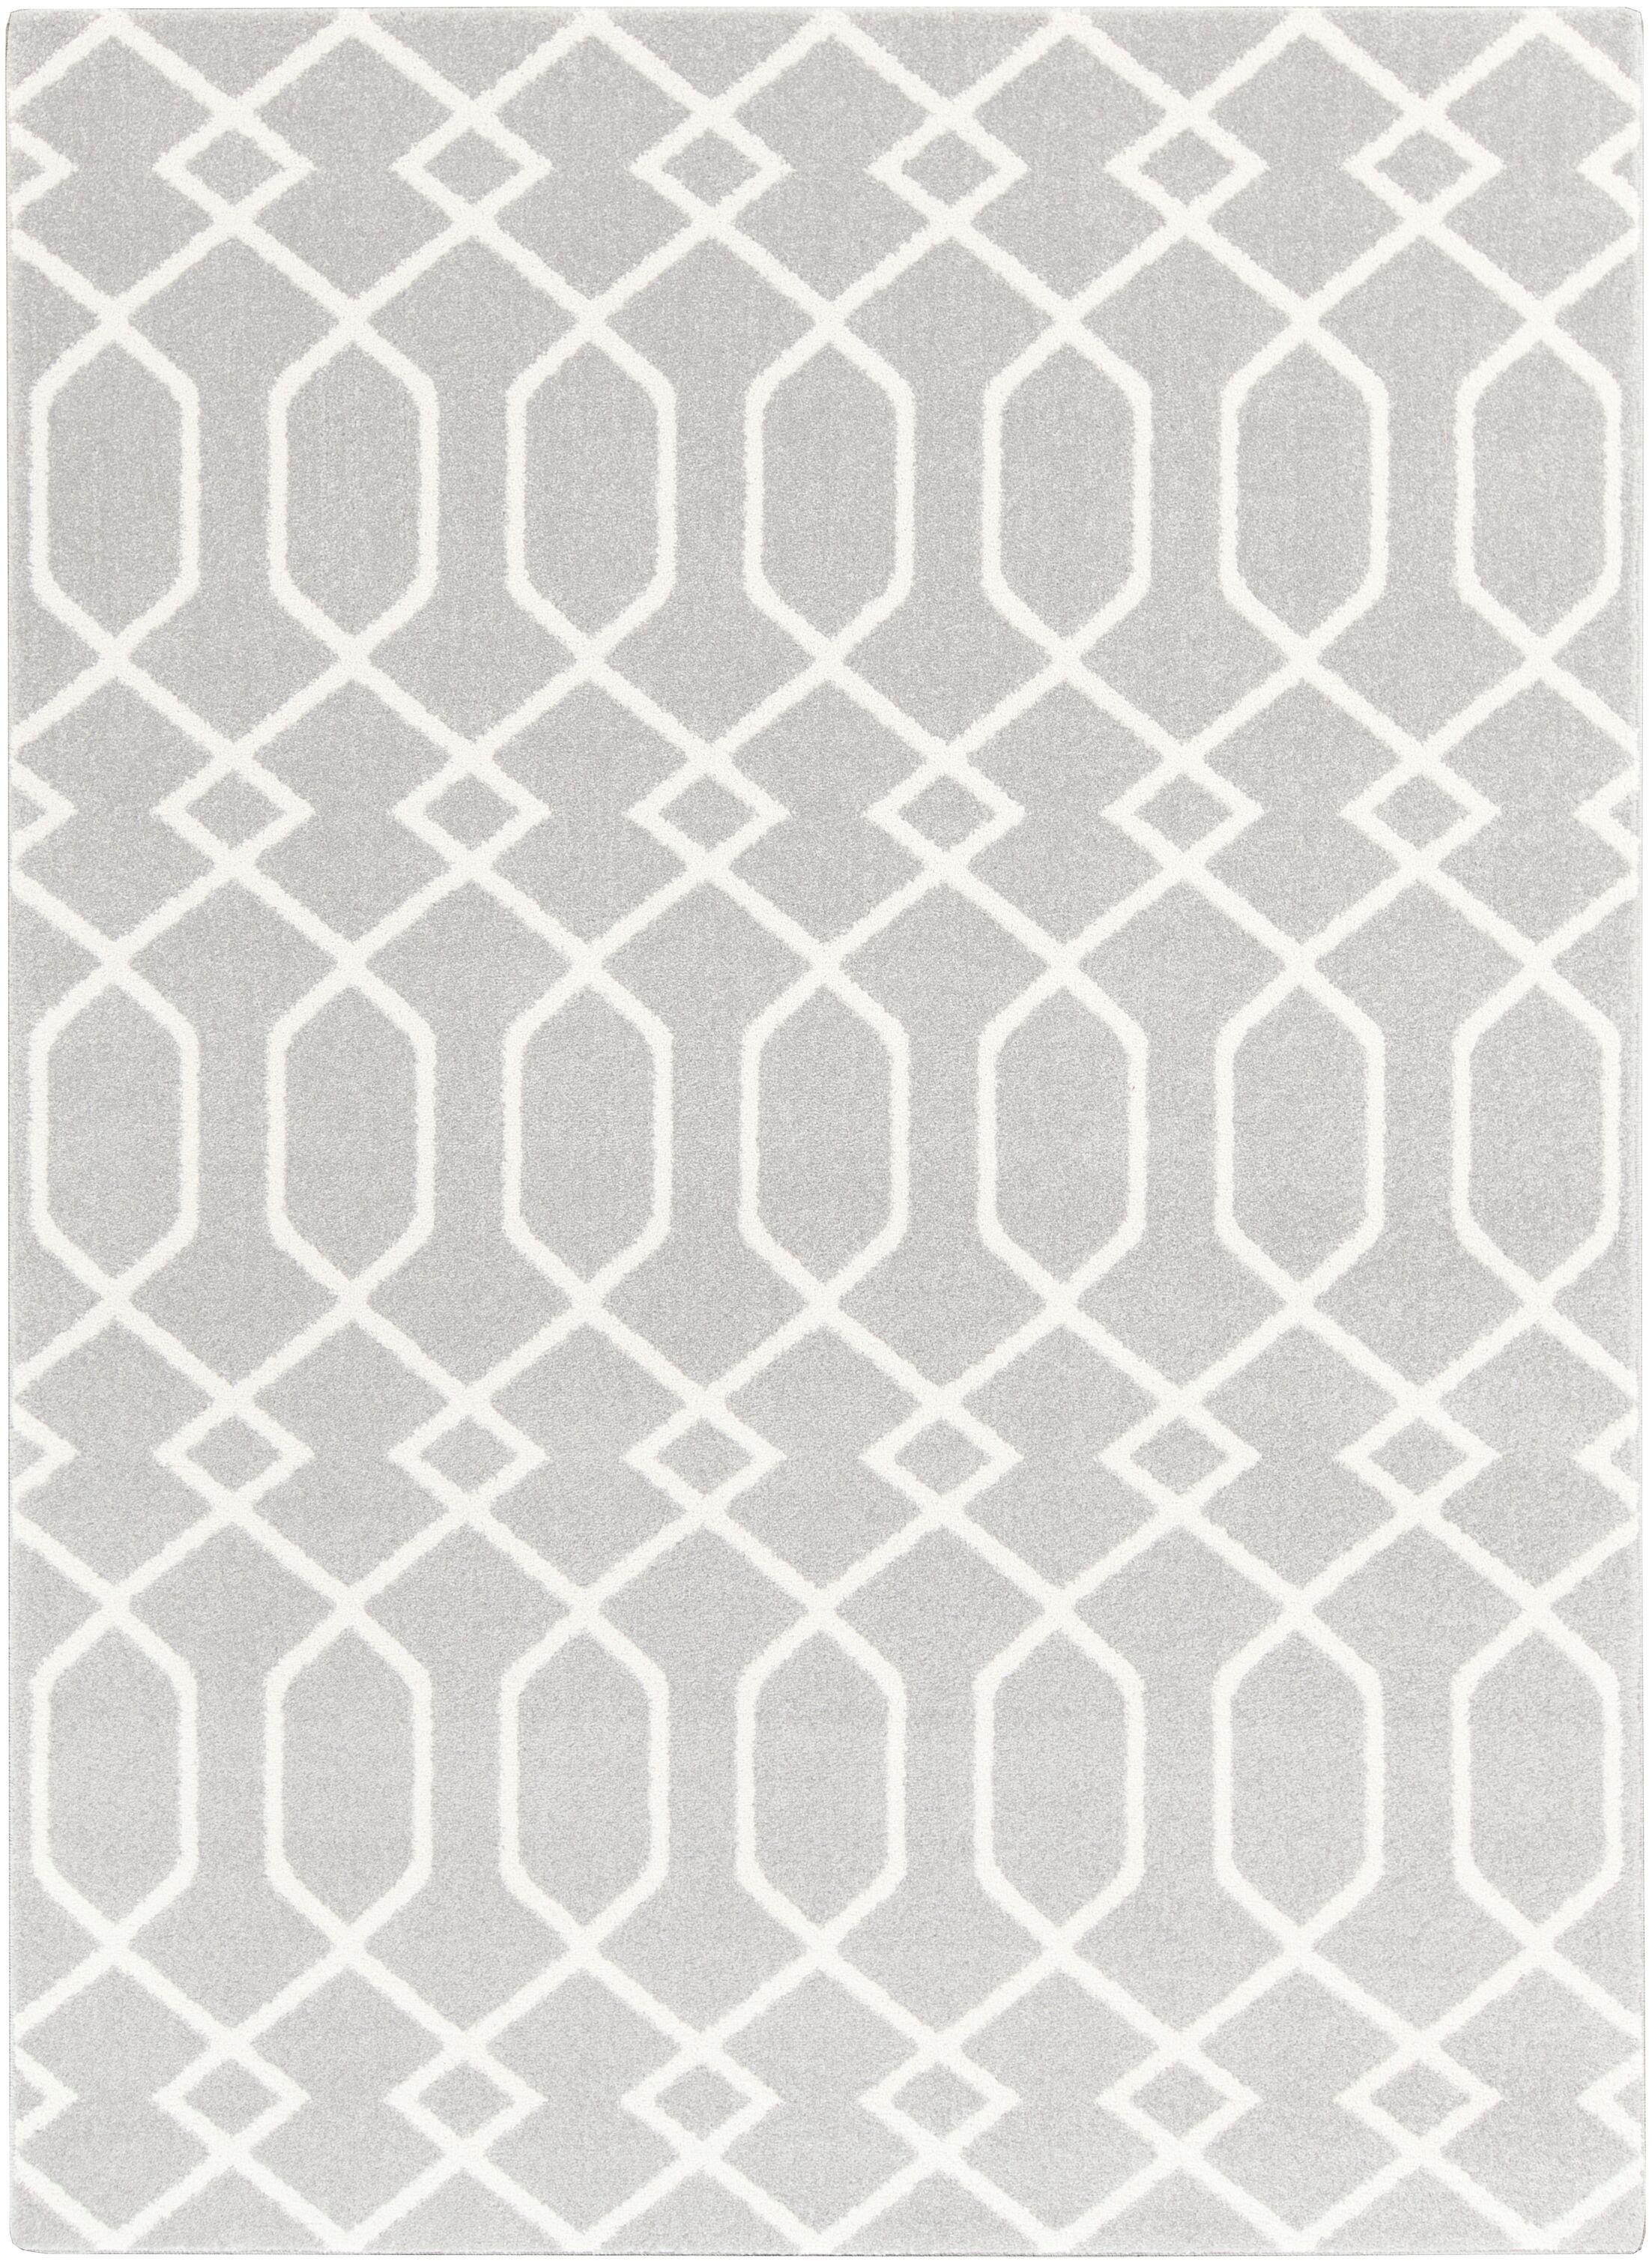 Siclen Gray/Ivory Area Rug Rug Size: Rectangle 7'10